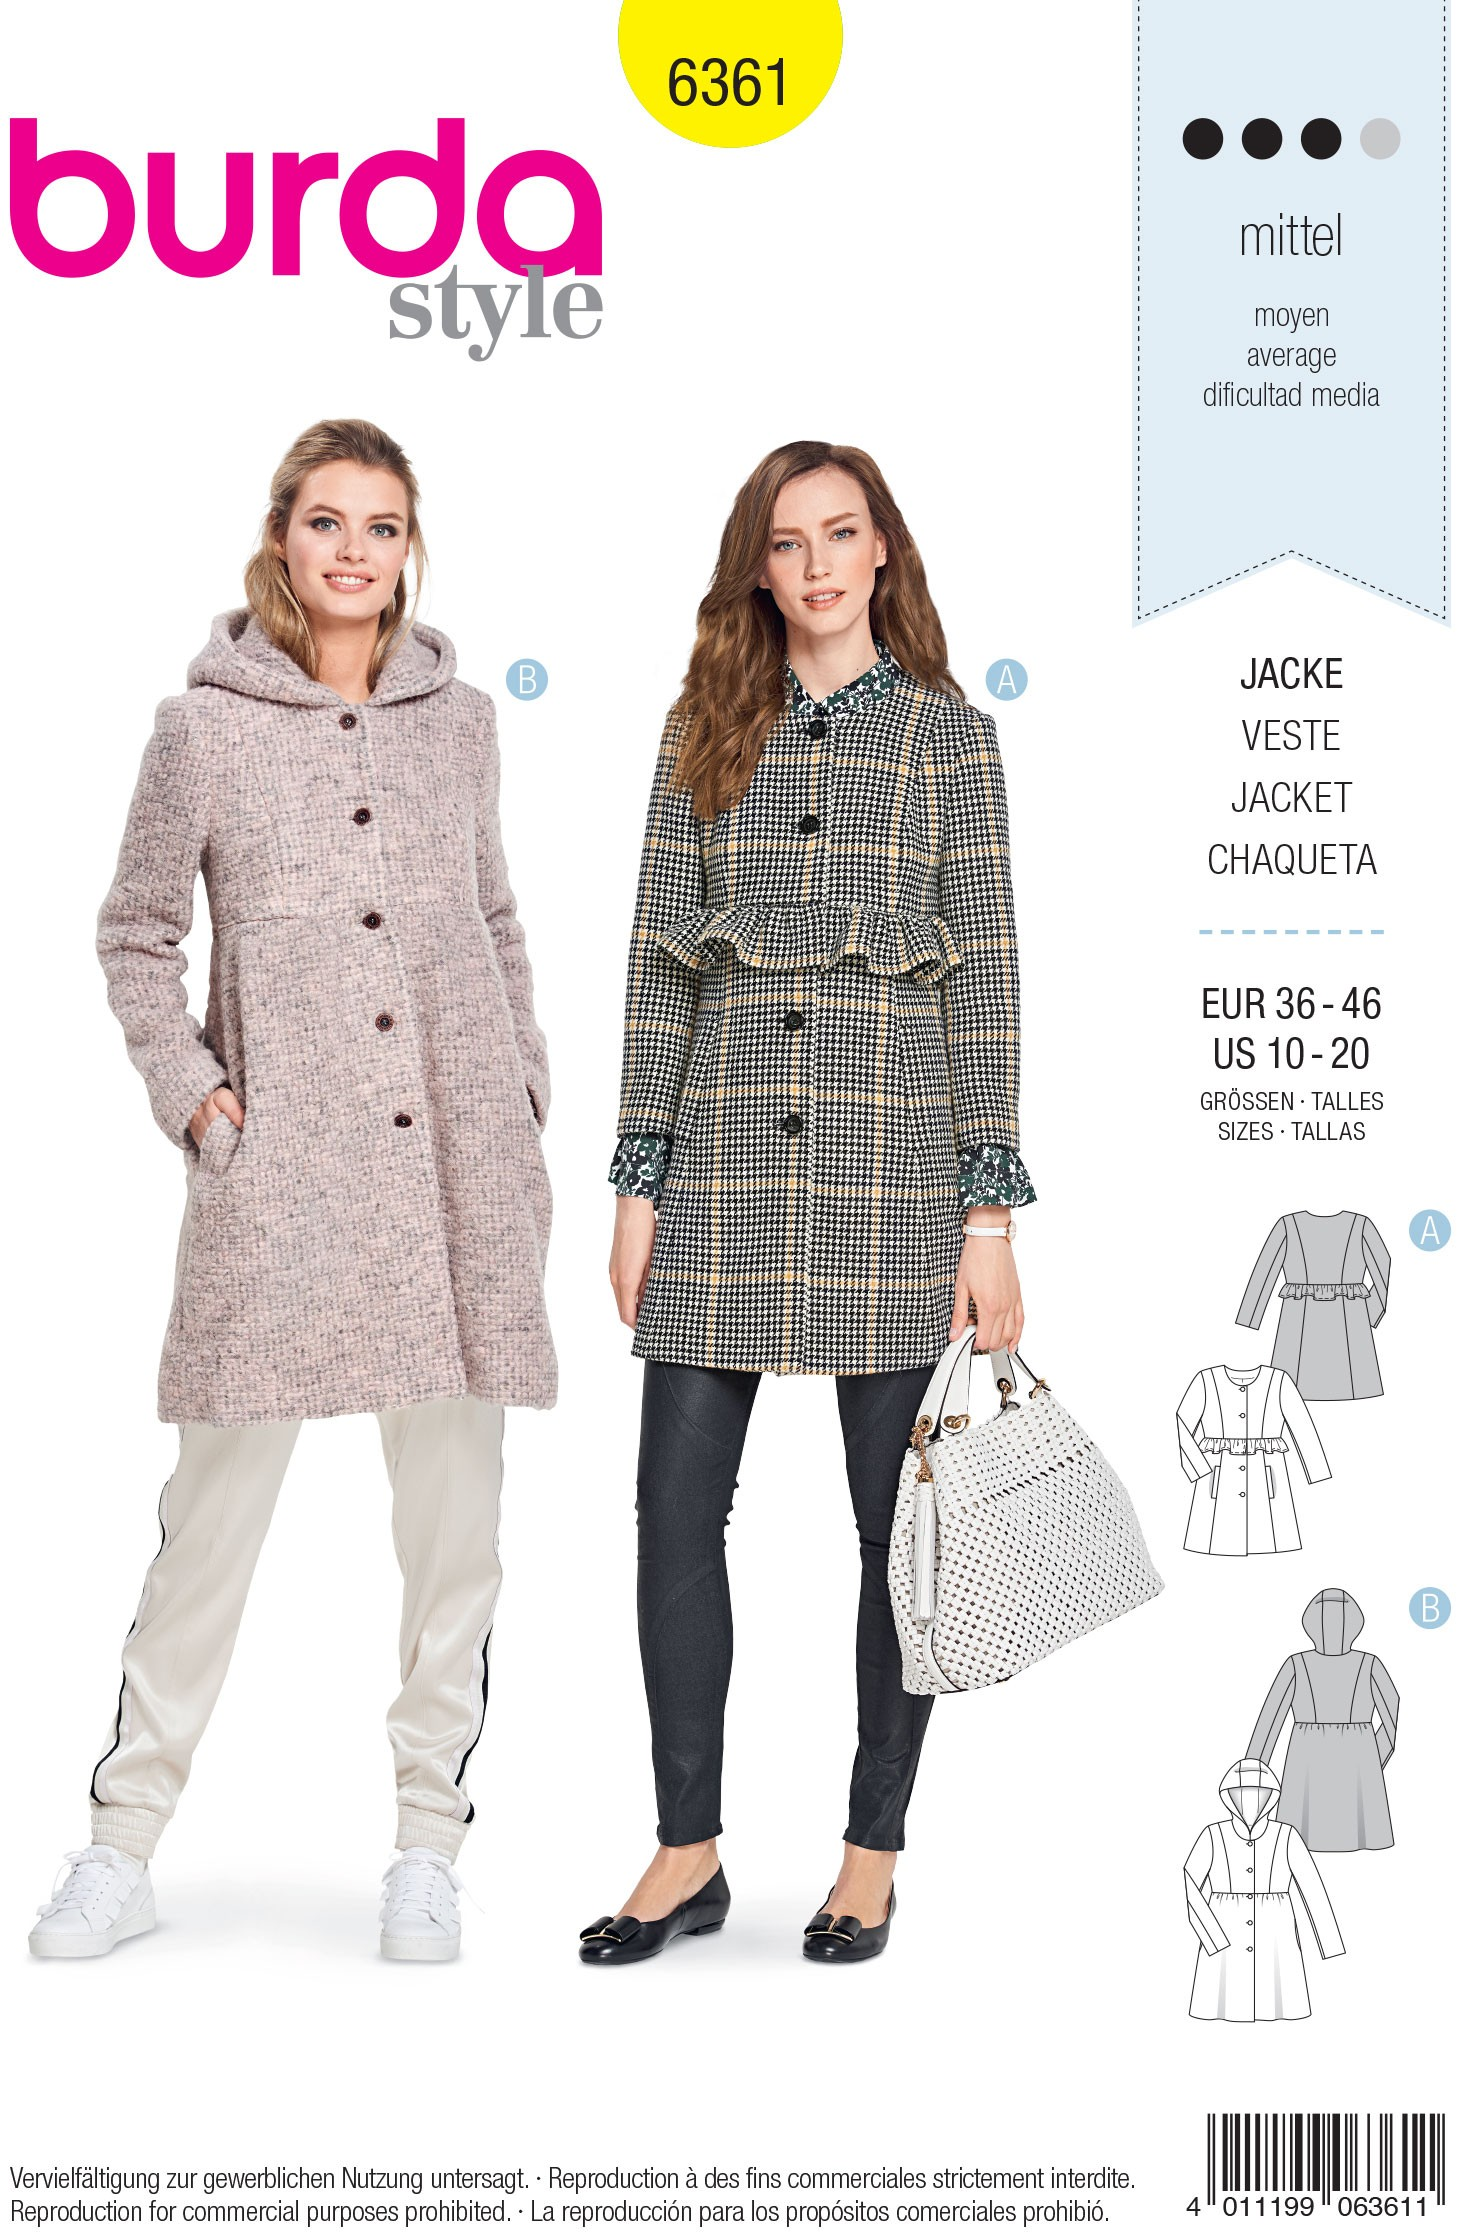 Burda Sewing Pattern 6361 Style Misses' Smart Formal Coat Jacket